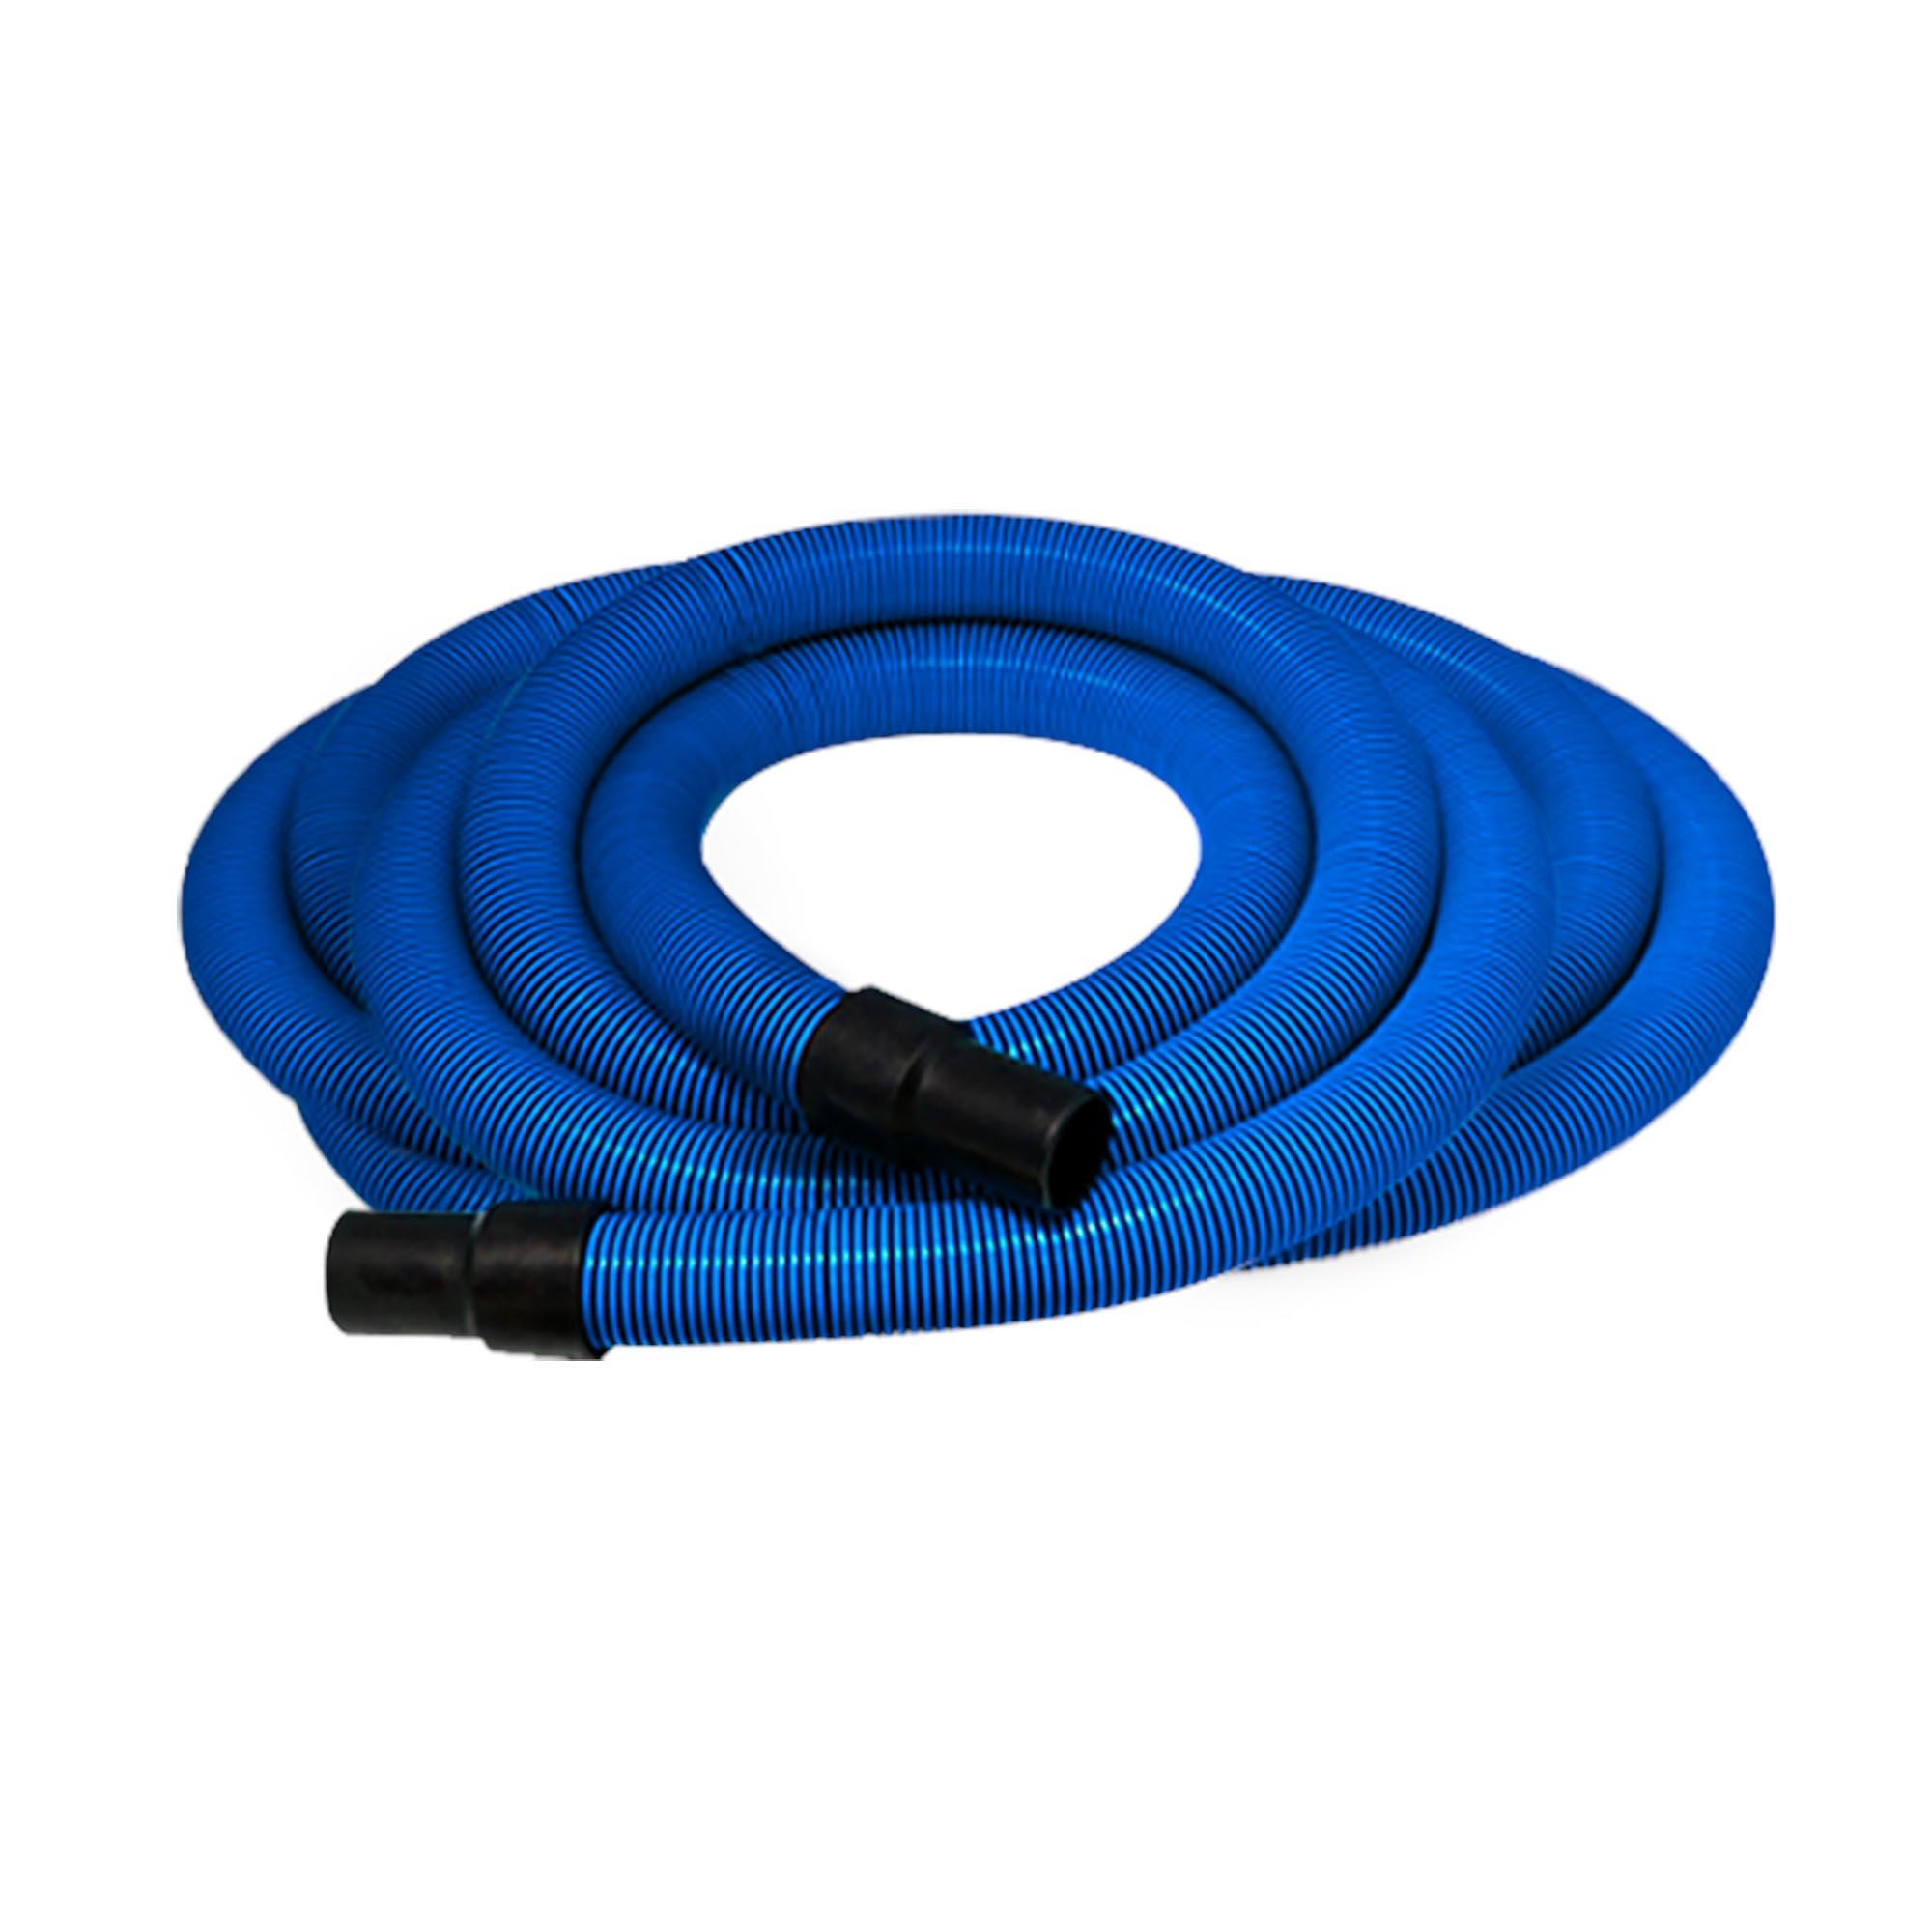 "Model 6580-20 20 ft. x 1-1/2"" Static Resistant hose"